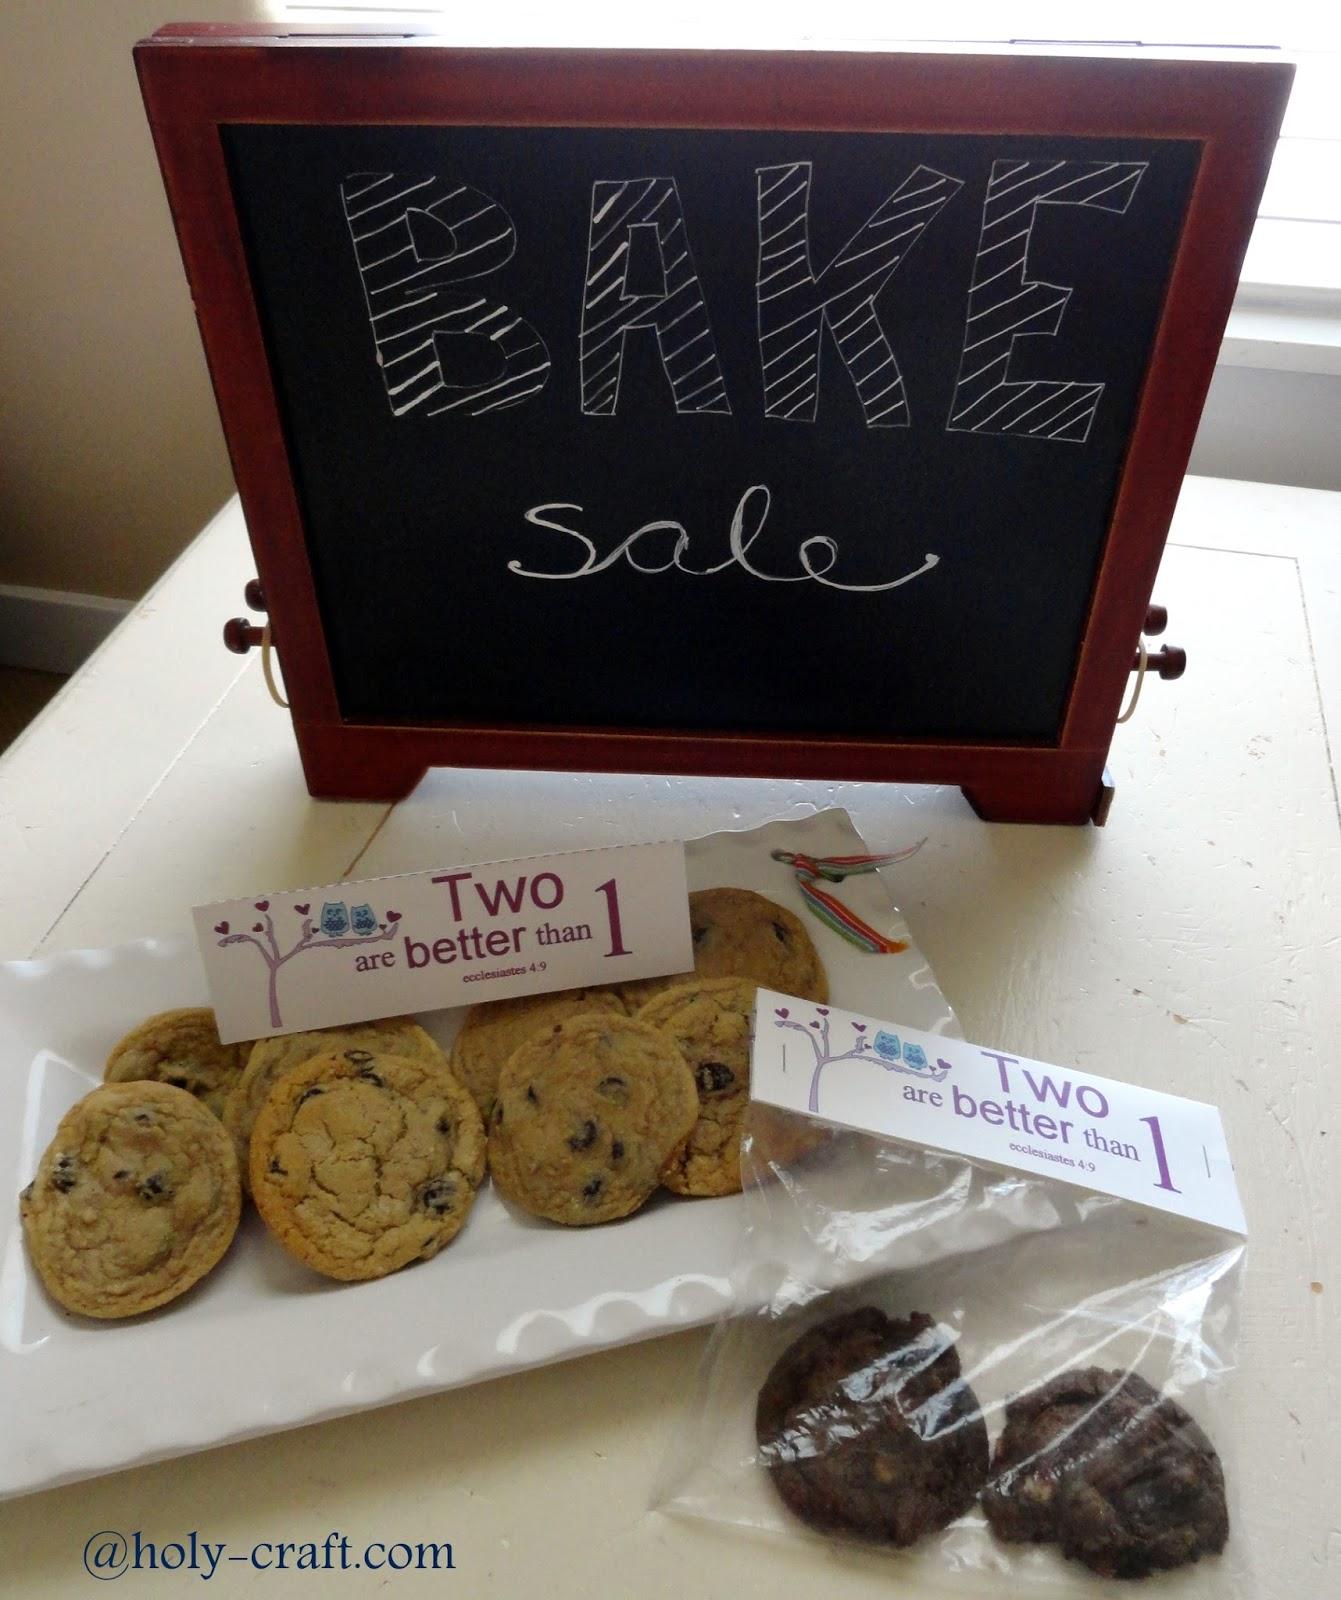 http://4.bp.blogspot.com/-aDvacr5G_w0/U3OpNqsqnaI/AAAAAAAAY9Q/mBRQmAdIEYU/s1600/bake+sale+final.jpg